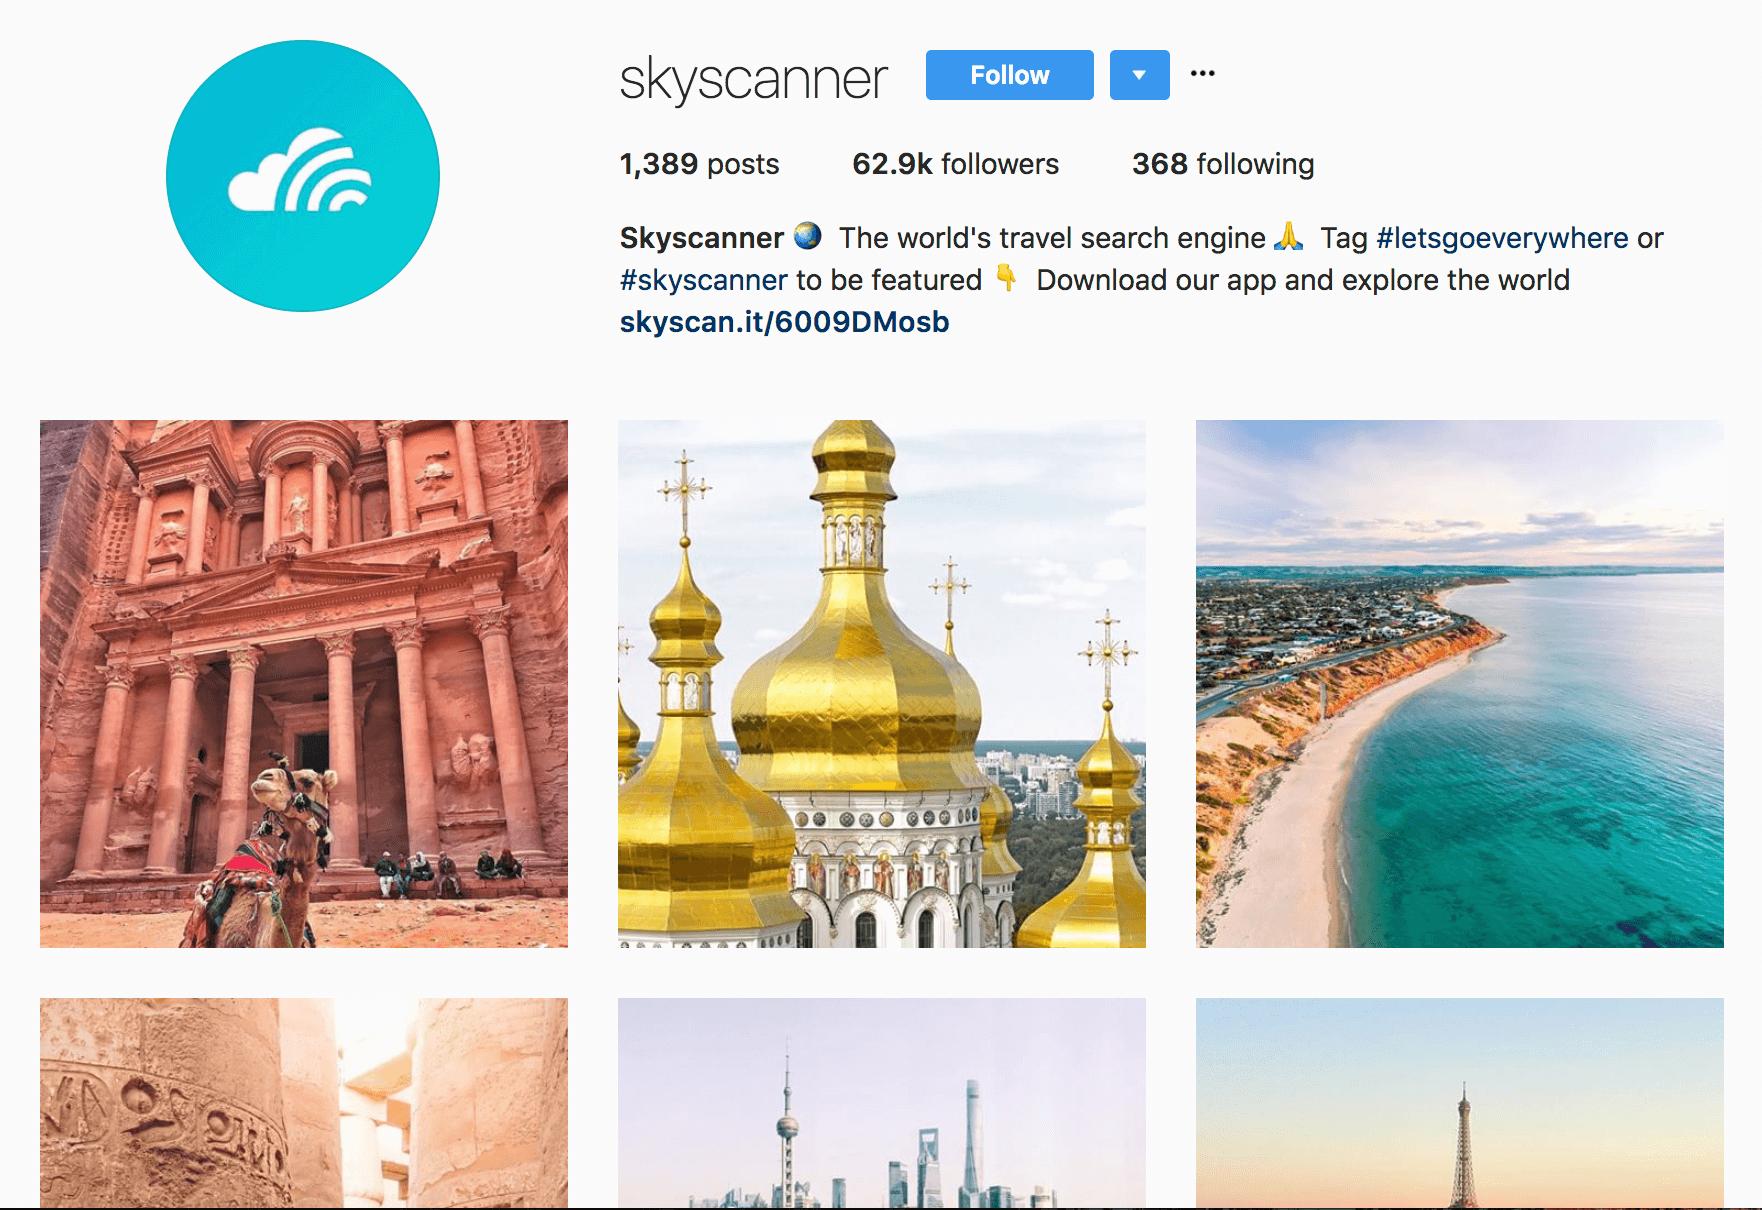 skyscanner instagram.png